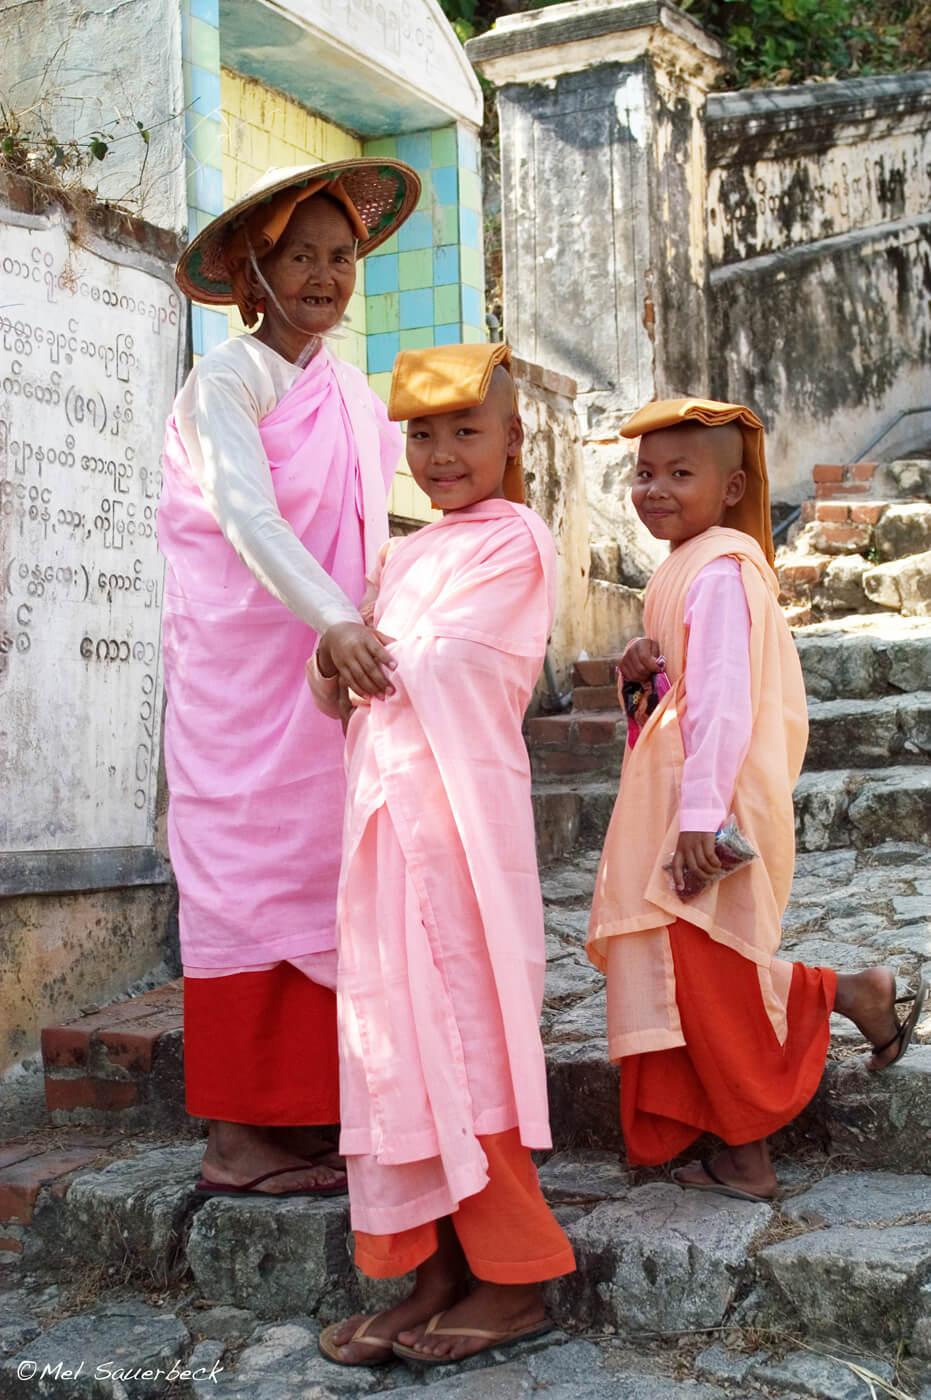 Lady monks on stairs, Myanmar, Burma